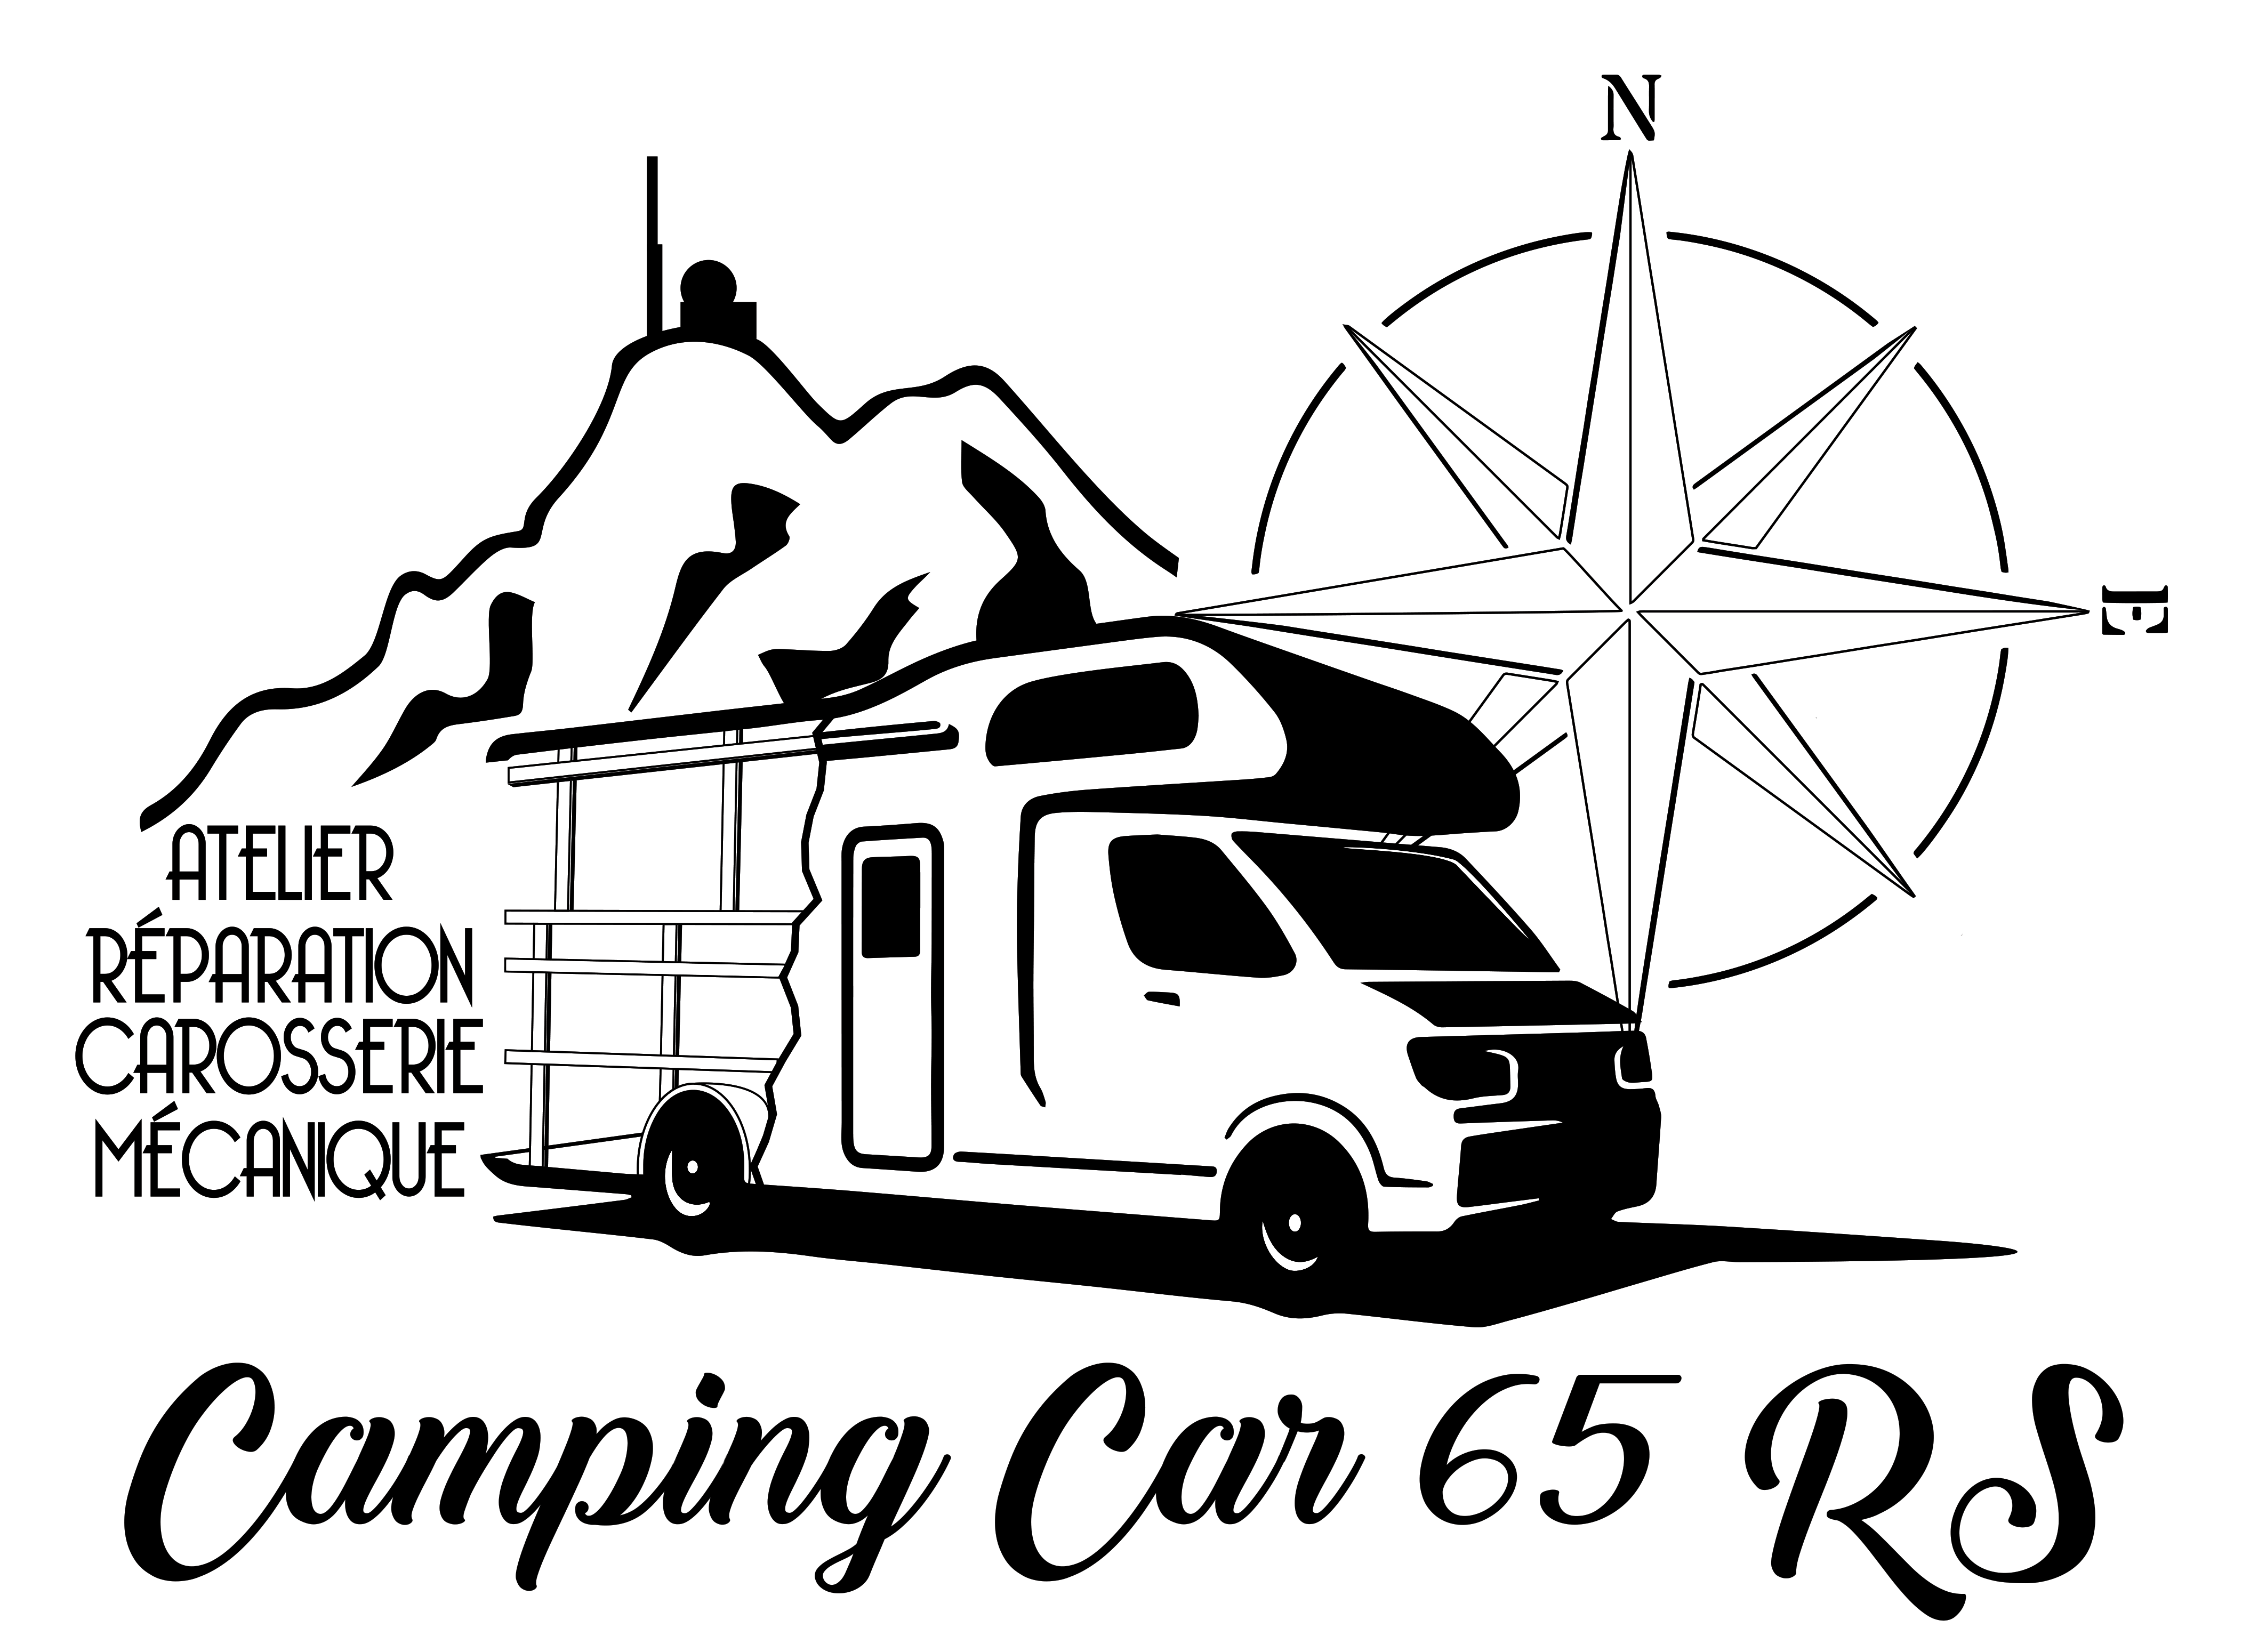 Camping-car 65 RS